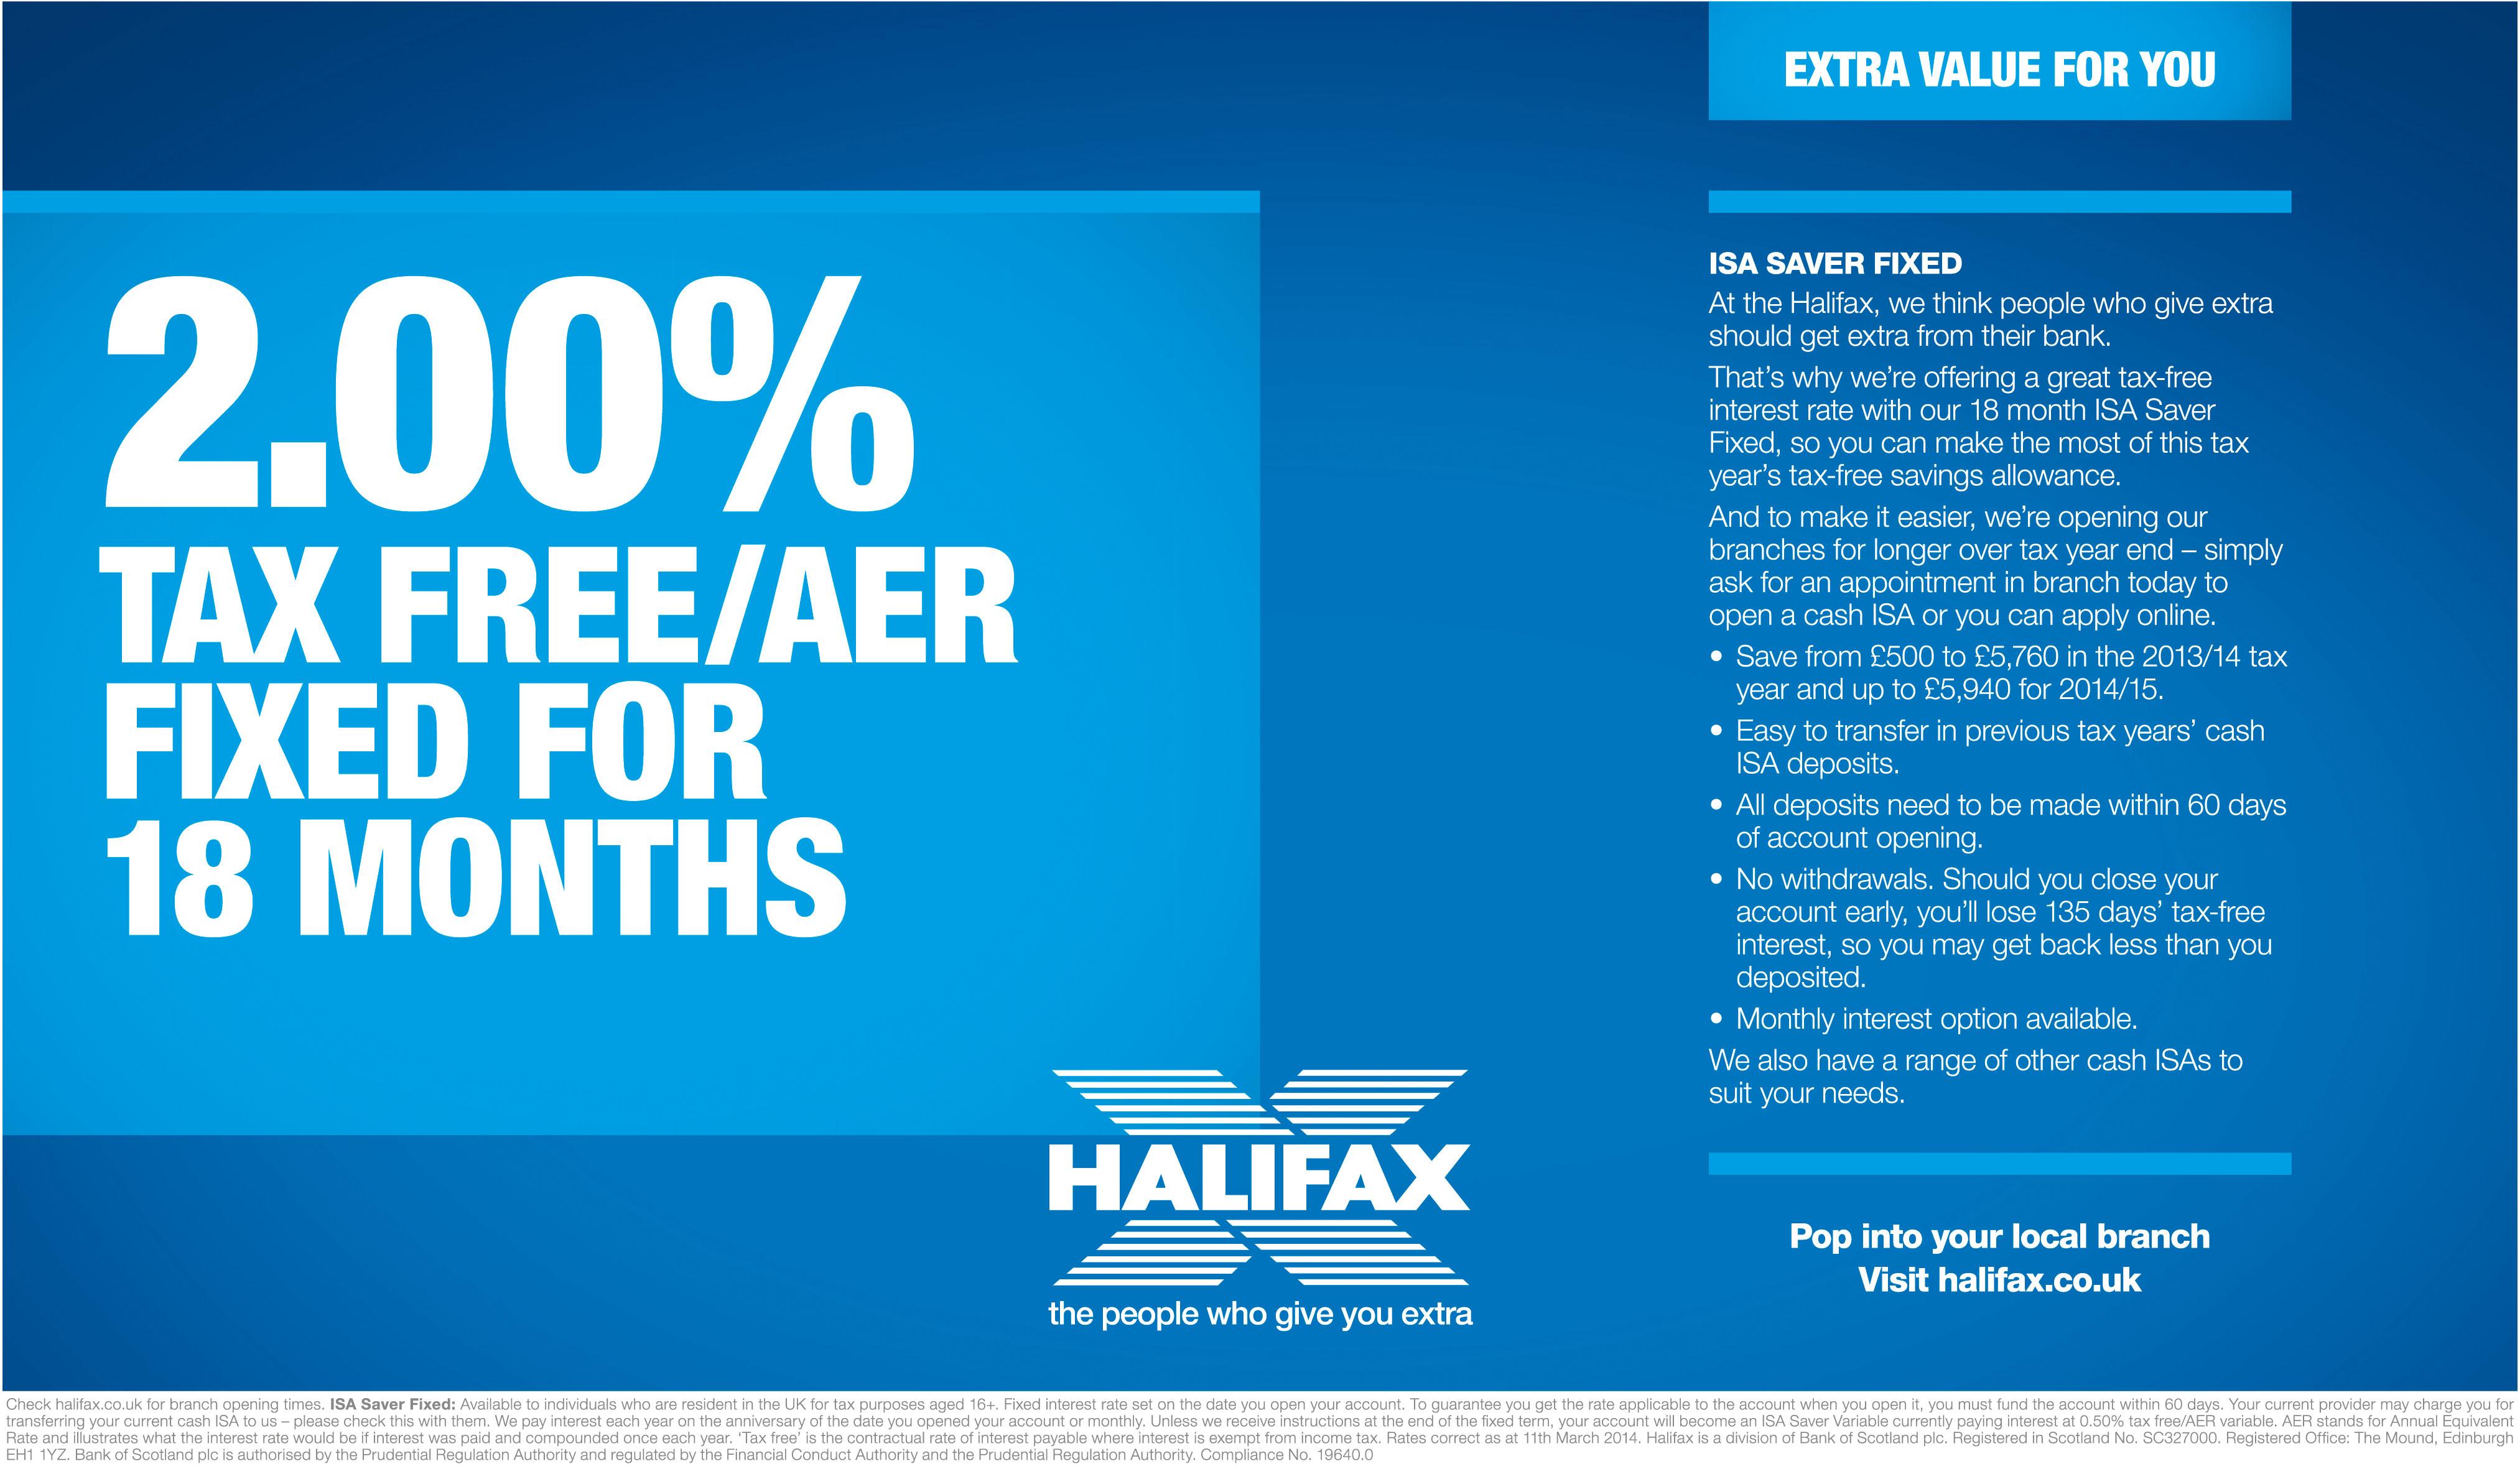 Halifax 2.0%